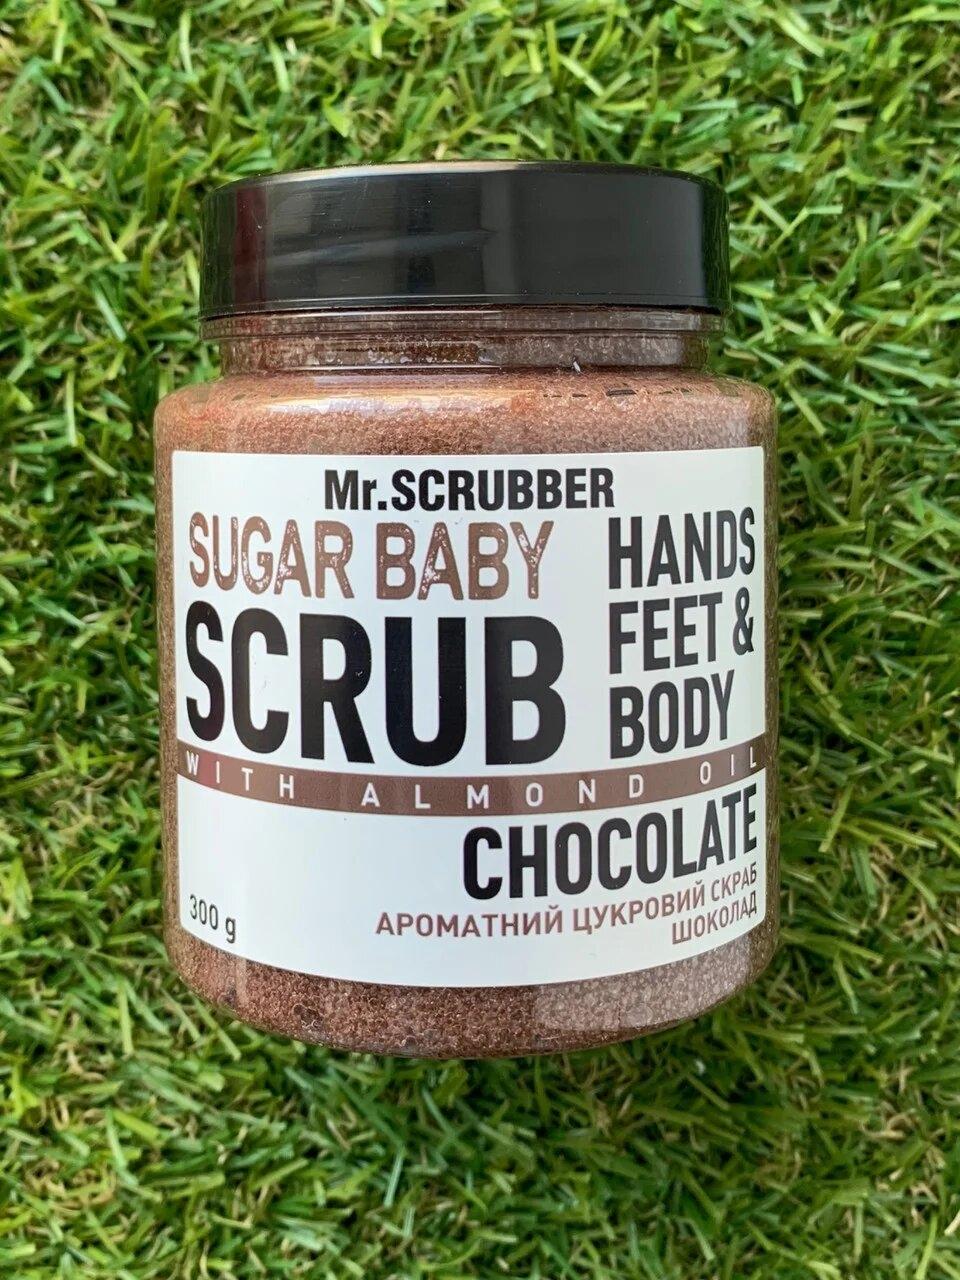 Скраб сахарный с ароматом шоколада для тела Mr.Scrubber Sugar Baby Chocolate 300g 0 - Фото 1